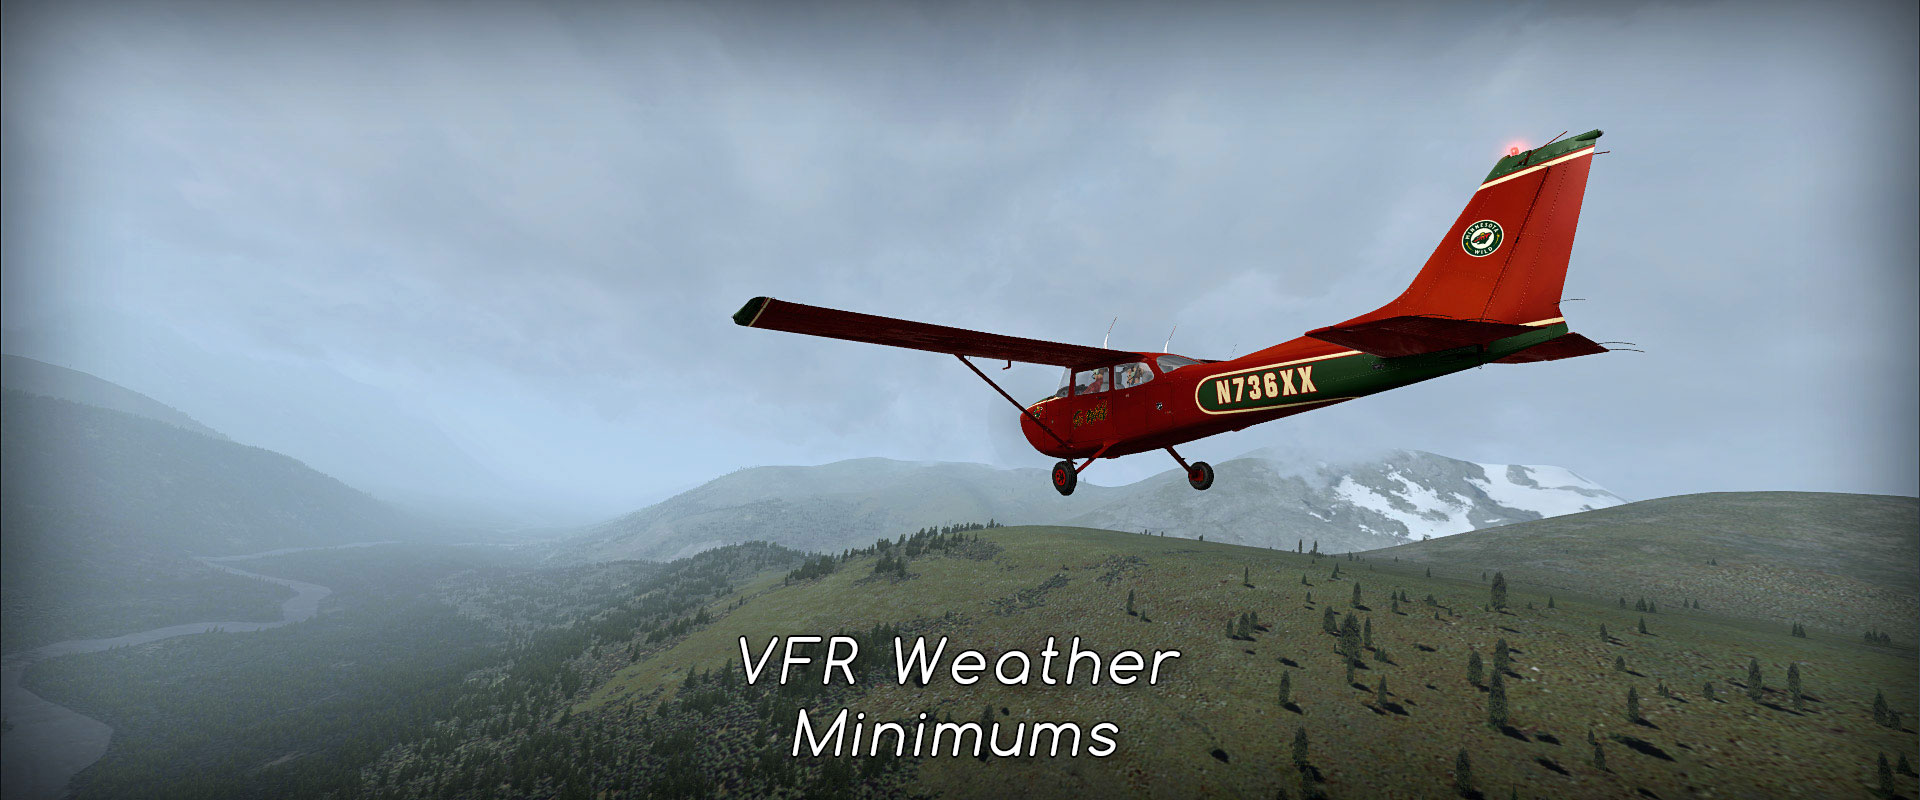 VFR Weather Minimums